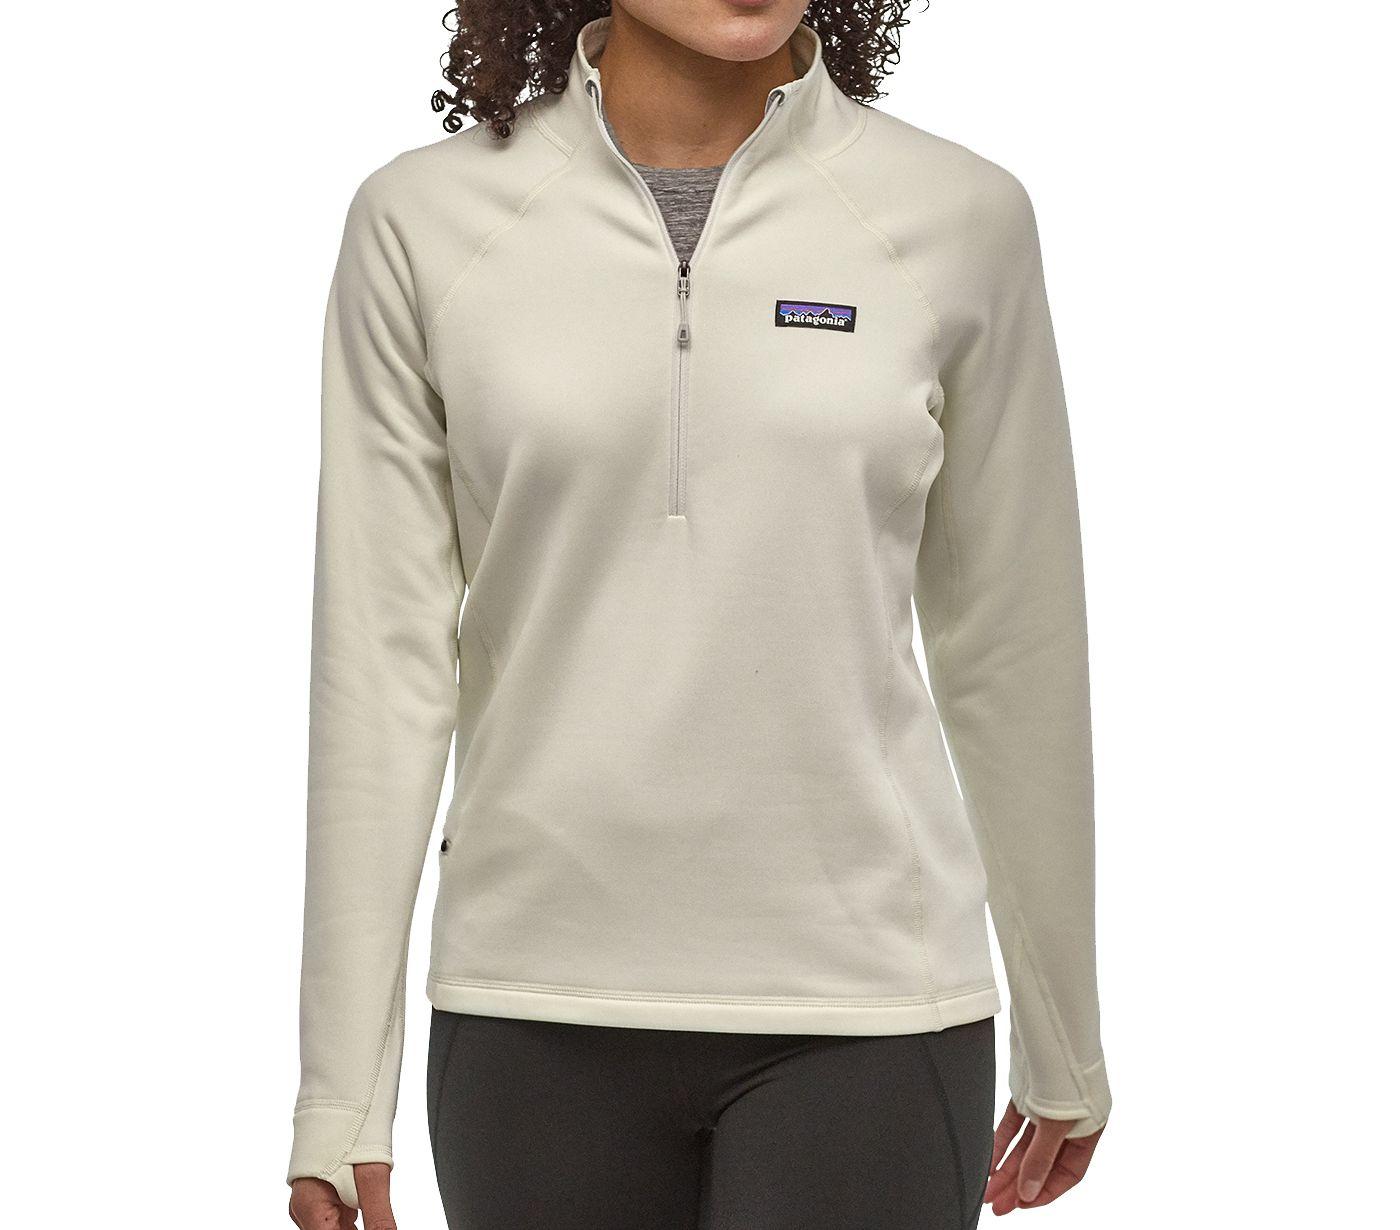 Patagonia Women's Trek Quarter Zip Pullover